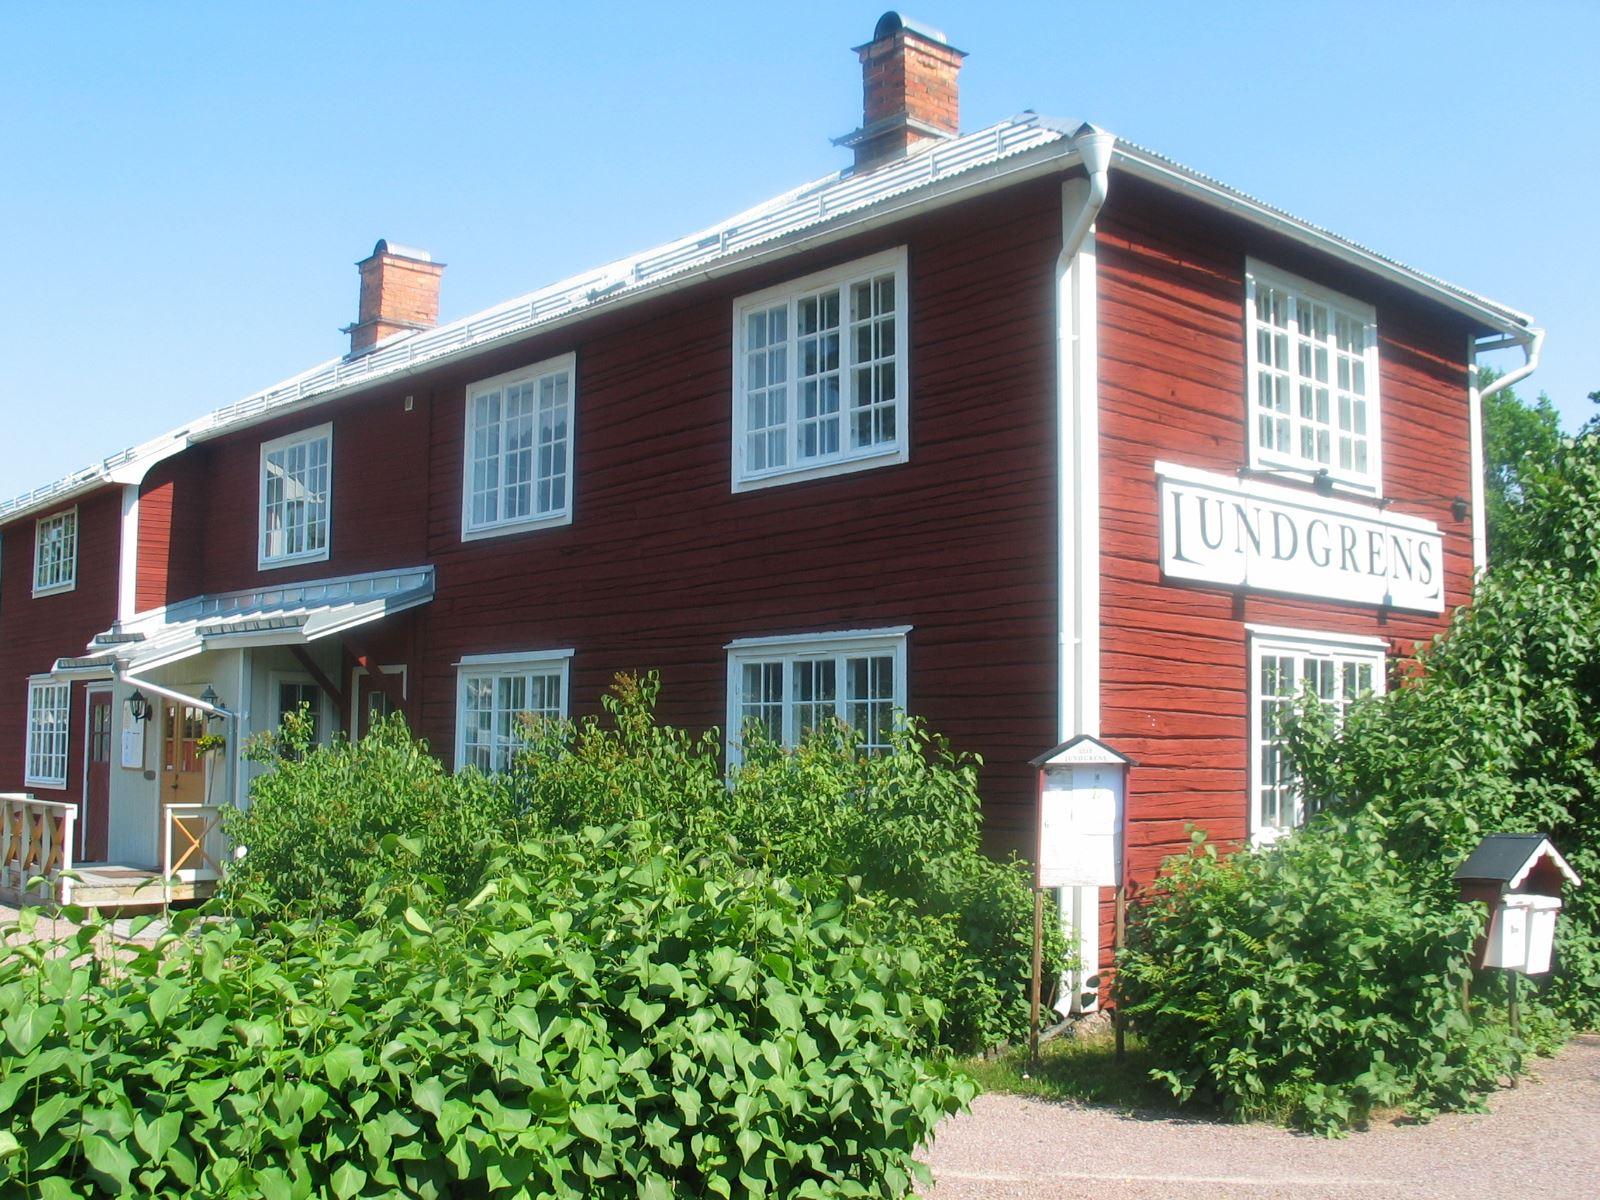 Lundgrens Ramlistmuseum